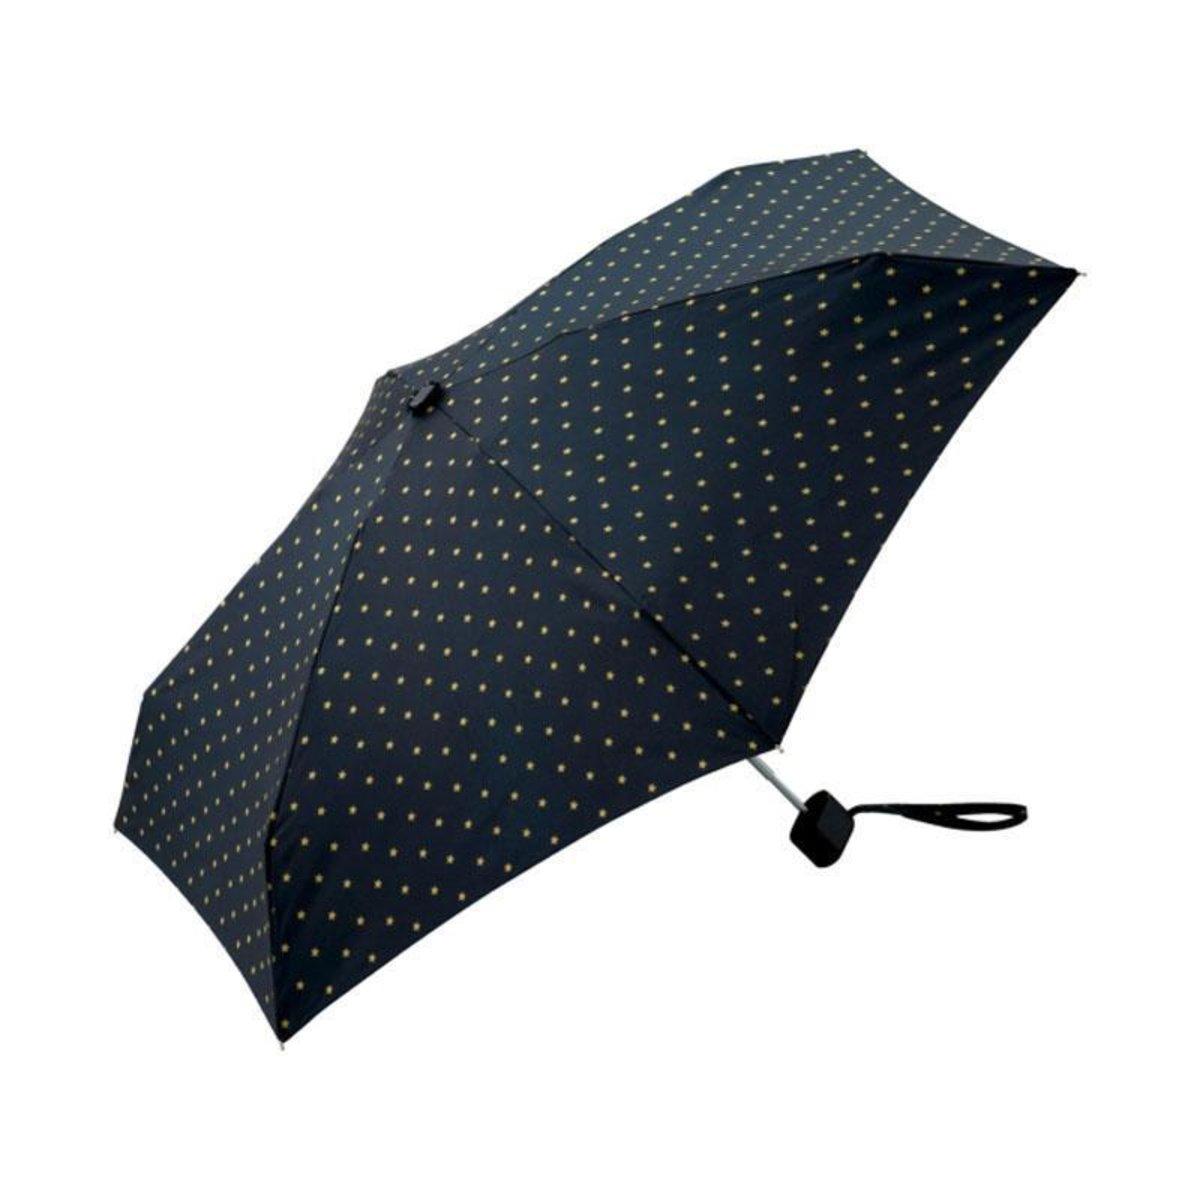 KiU Tiny Mini shifty cover anti-UV umbrella brand in Japan - Black Star Dot Star